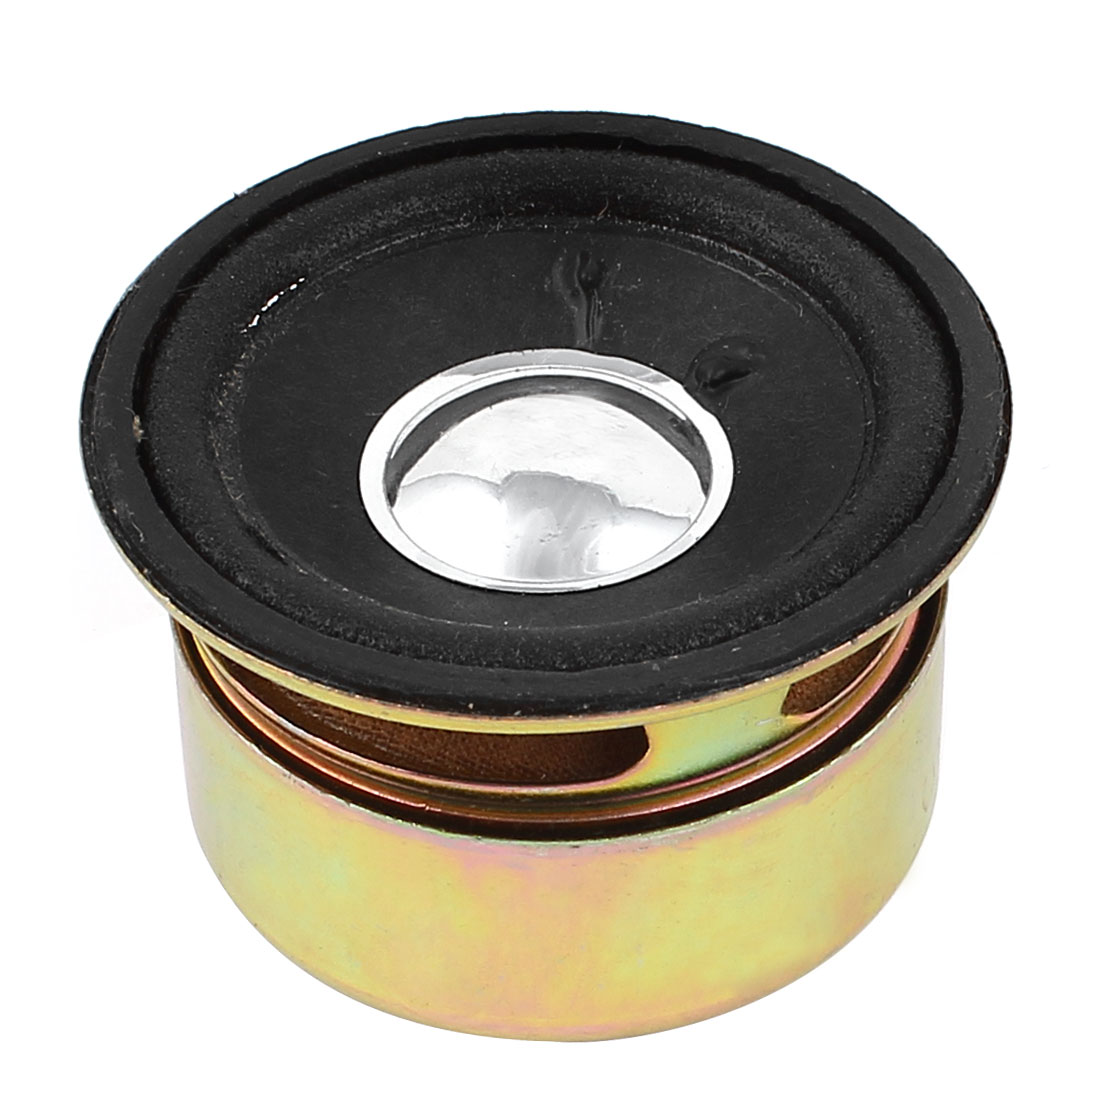 3W 4 Ohm 50mmx30mm Round Shape Metal Shell Magnet Electronic Speaker Loudspeaker